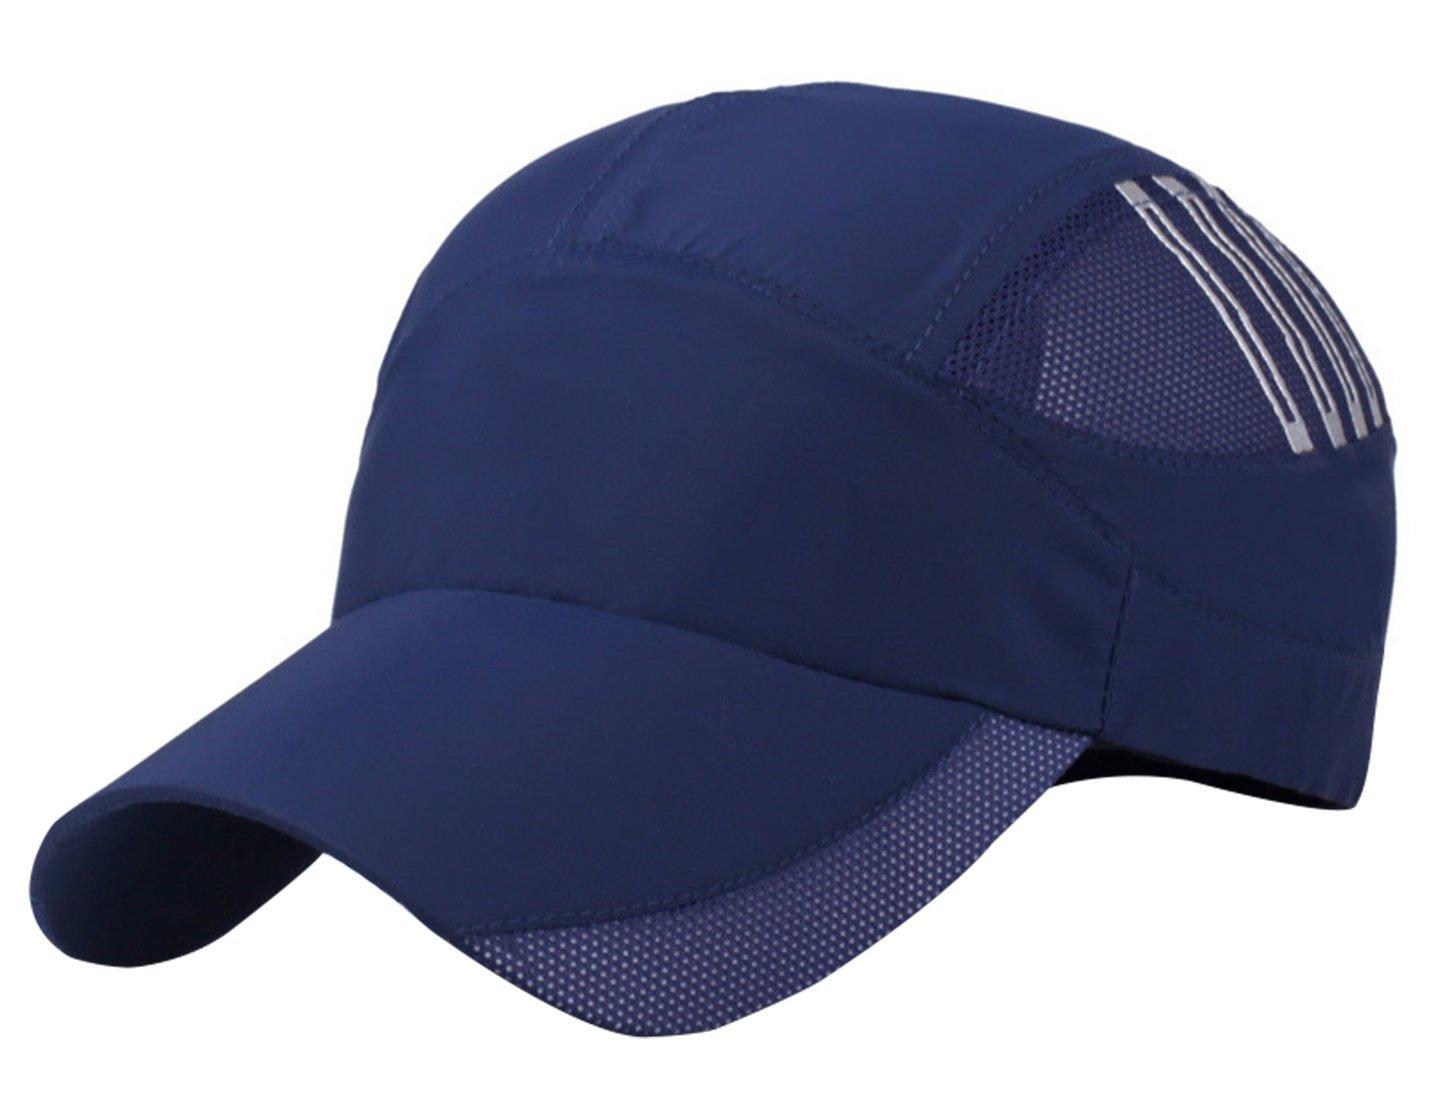 Aivtalk Running Sports Cap Unisex Summer Quick Dry Mesh Outdoor Sun Hat Performance Lightweight Breathable Soft Dark Blue